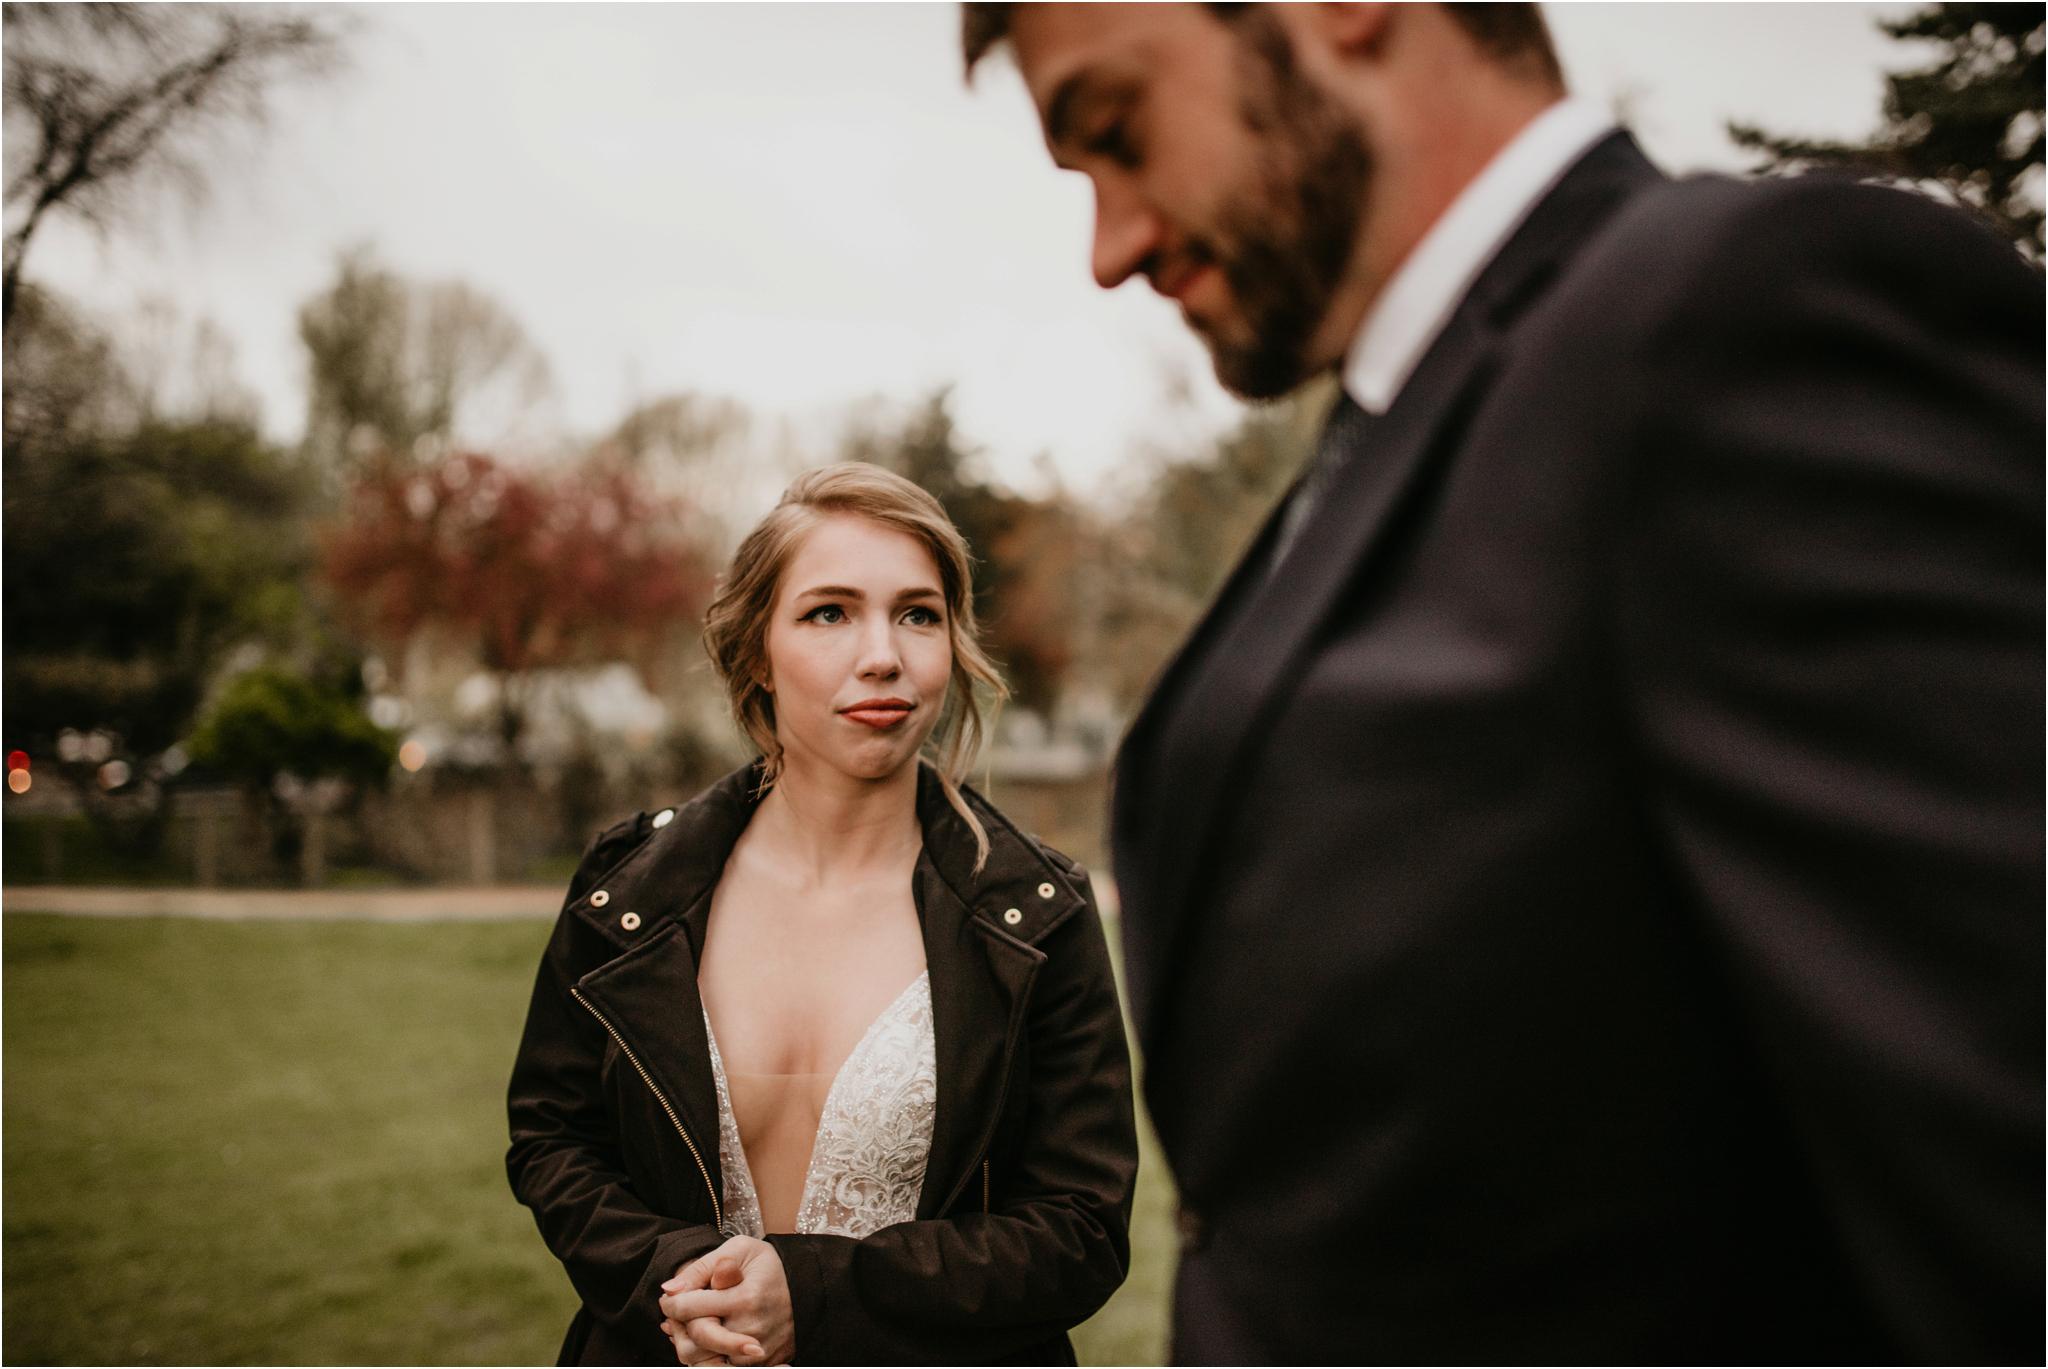 miranda-and-jared-paris-elopement-destination-wedding-photographer-026.jpg